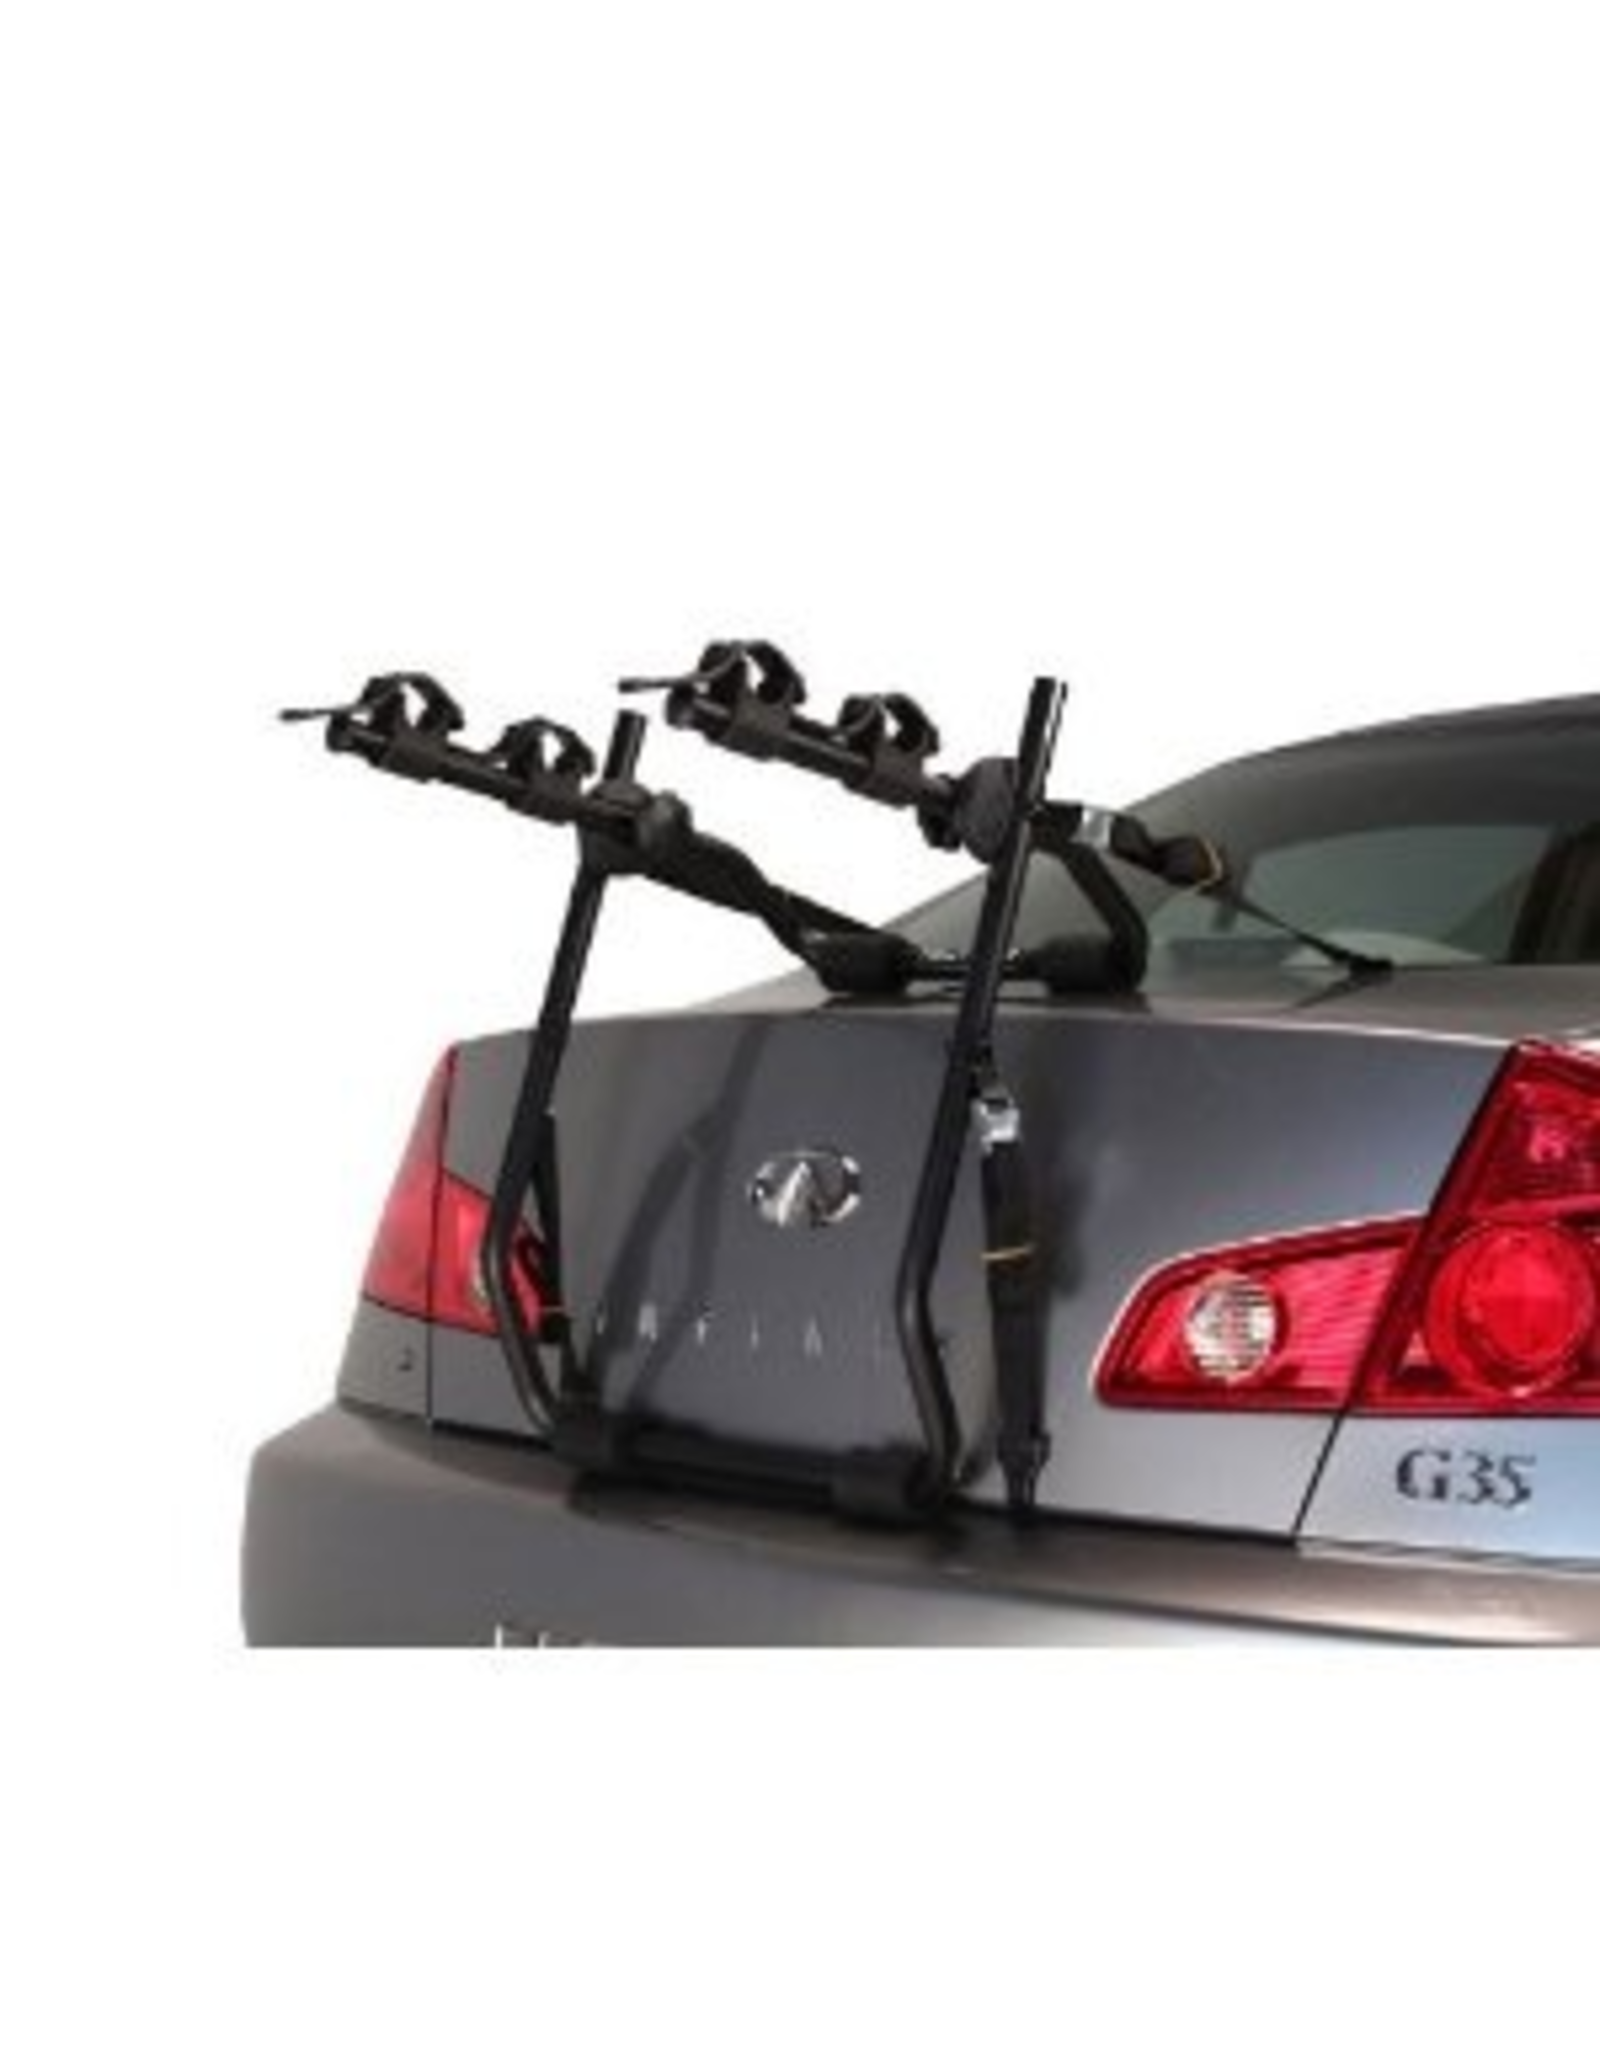 Hollywood Hollywood Trunk Rack E2 - Express, 2 Bike